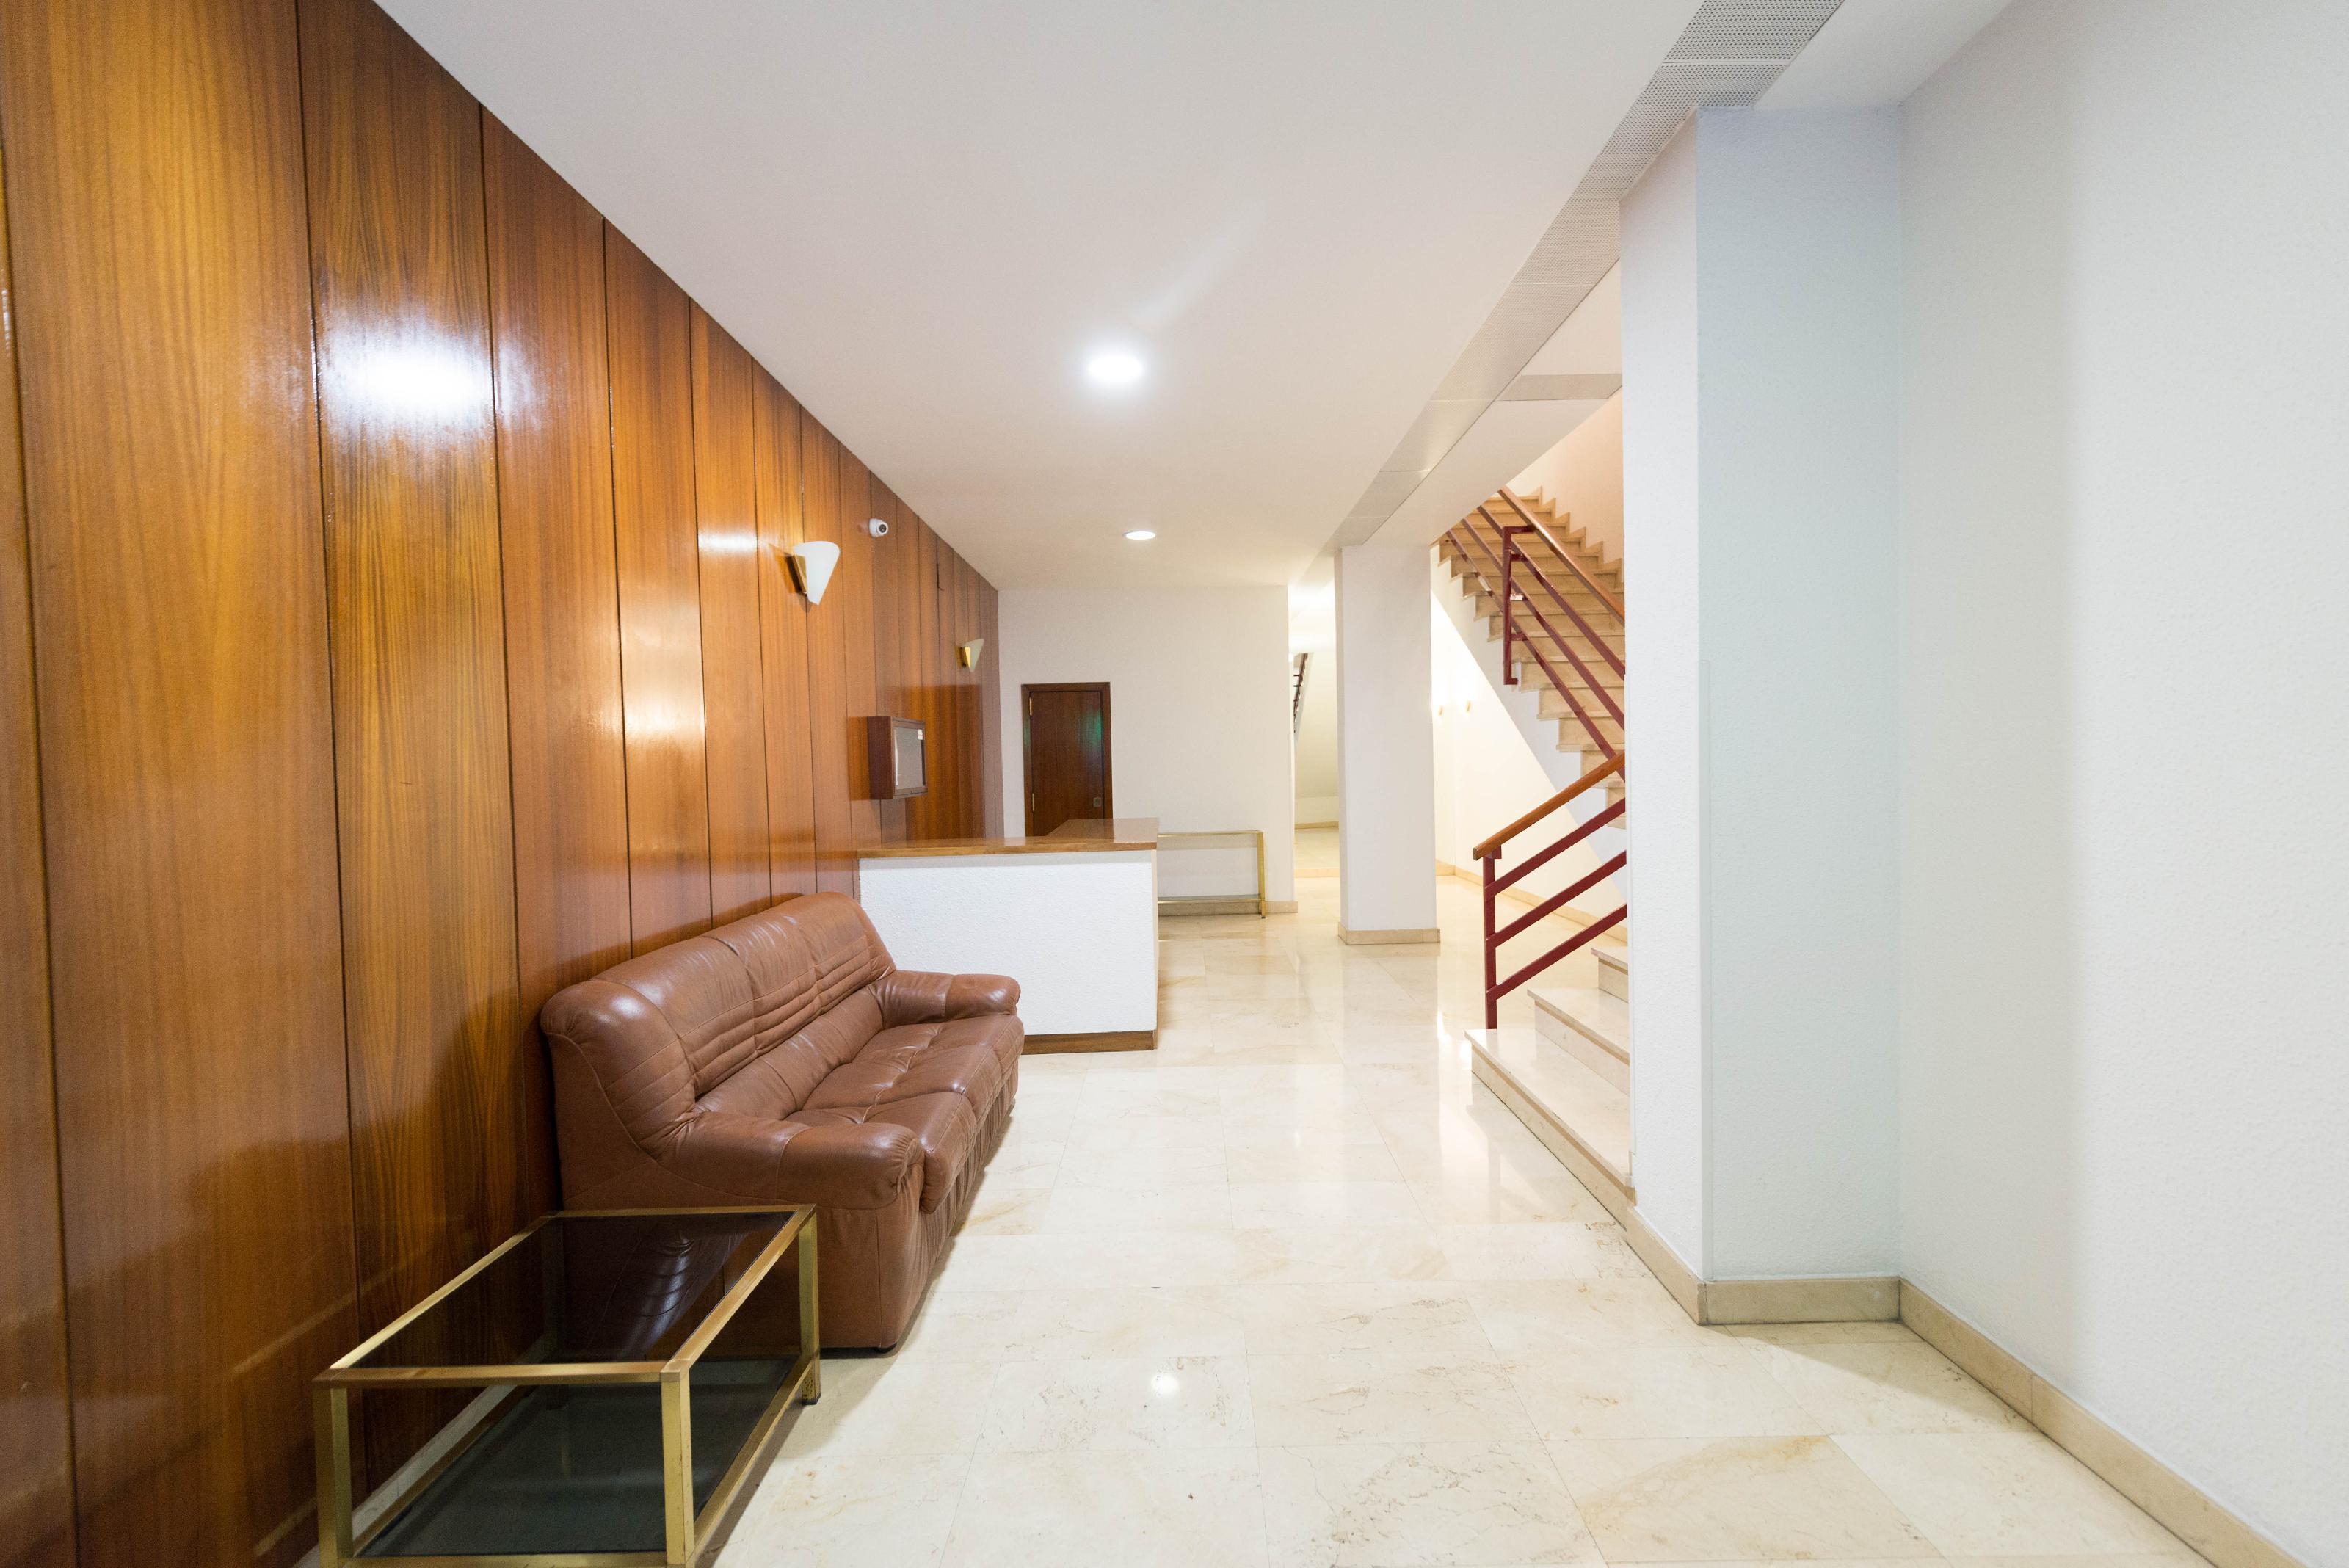 242980 Flat for sale in Eixample, Sagrada Familia 21